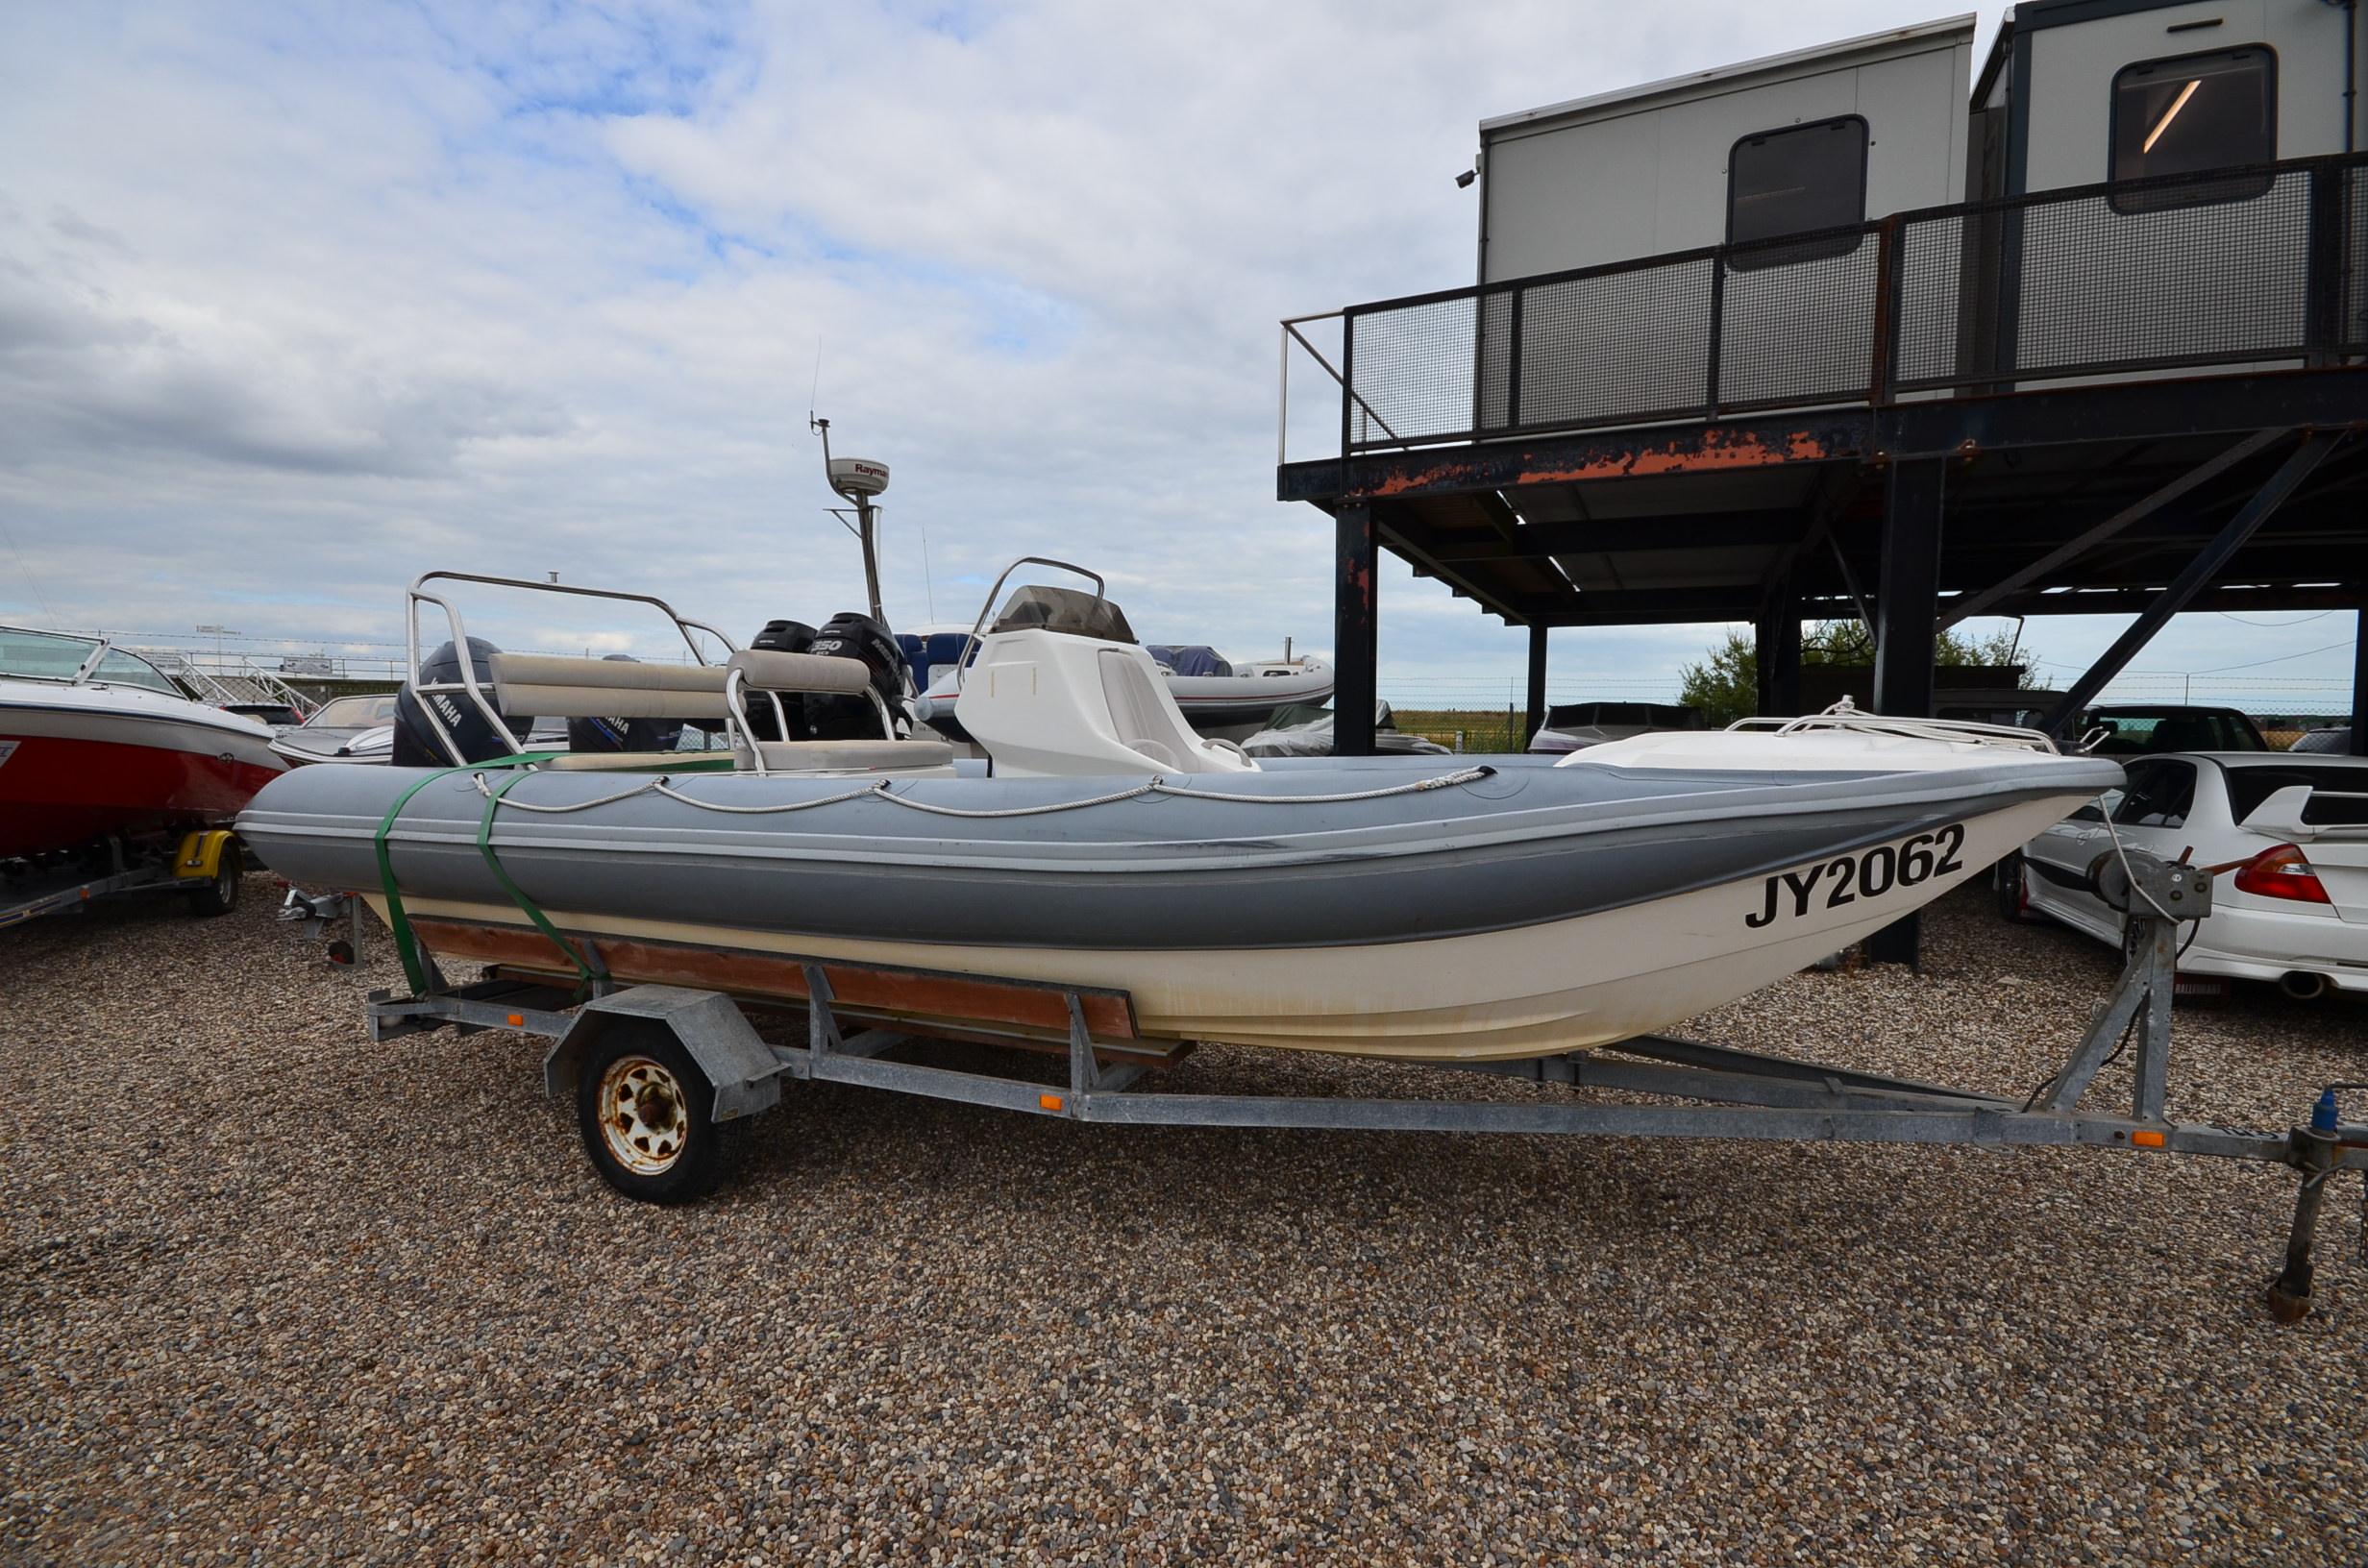 Hysucat 6 5M Rib for sale in United Kingdom for 9 950 £